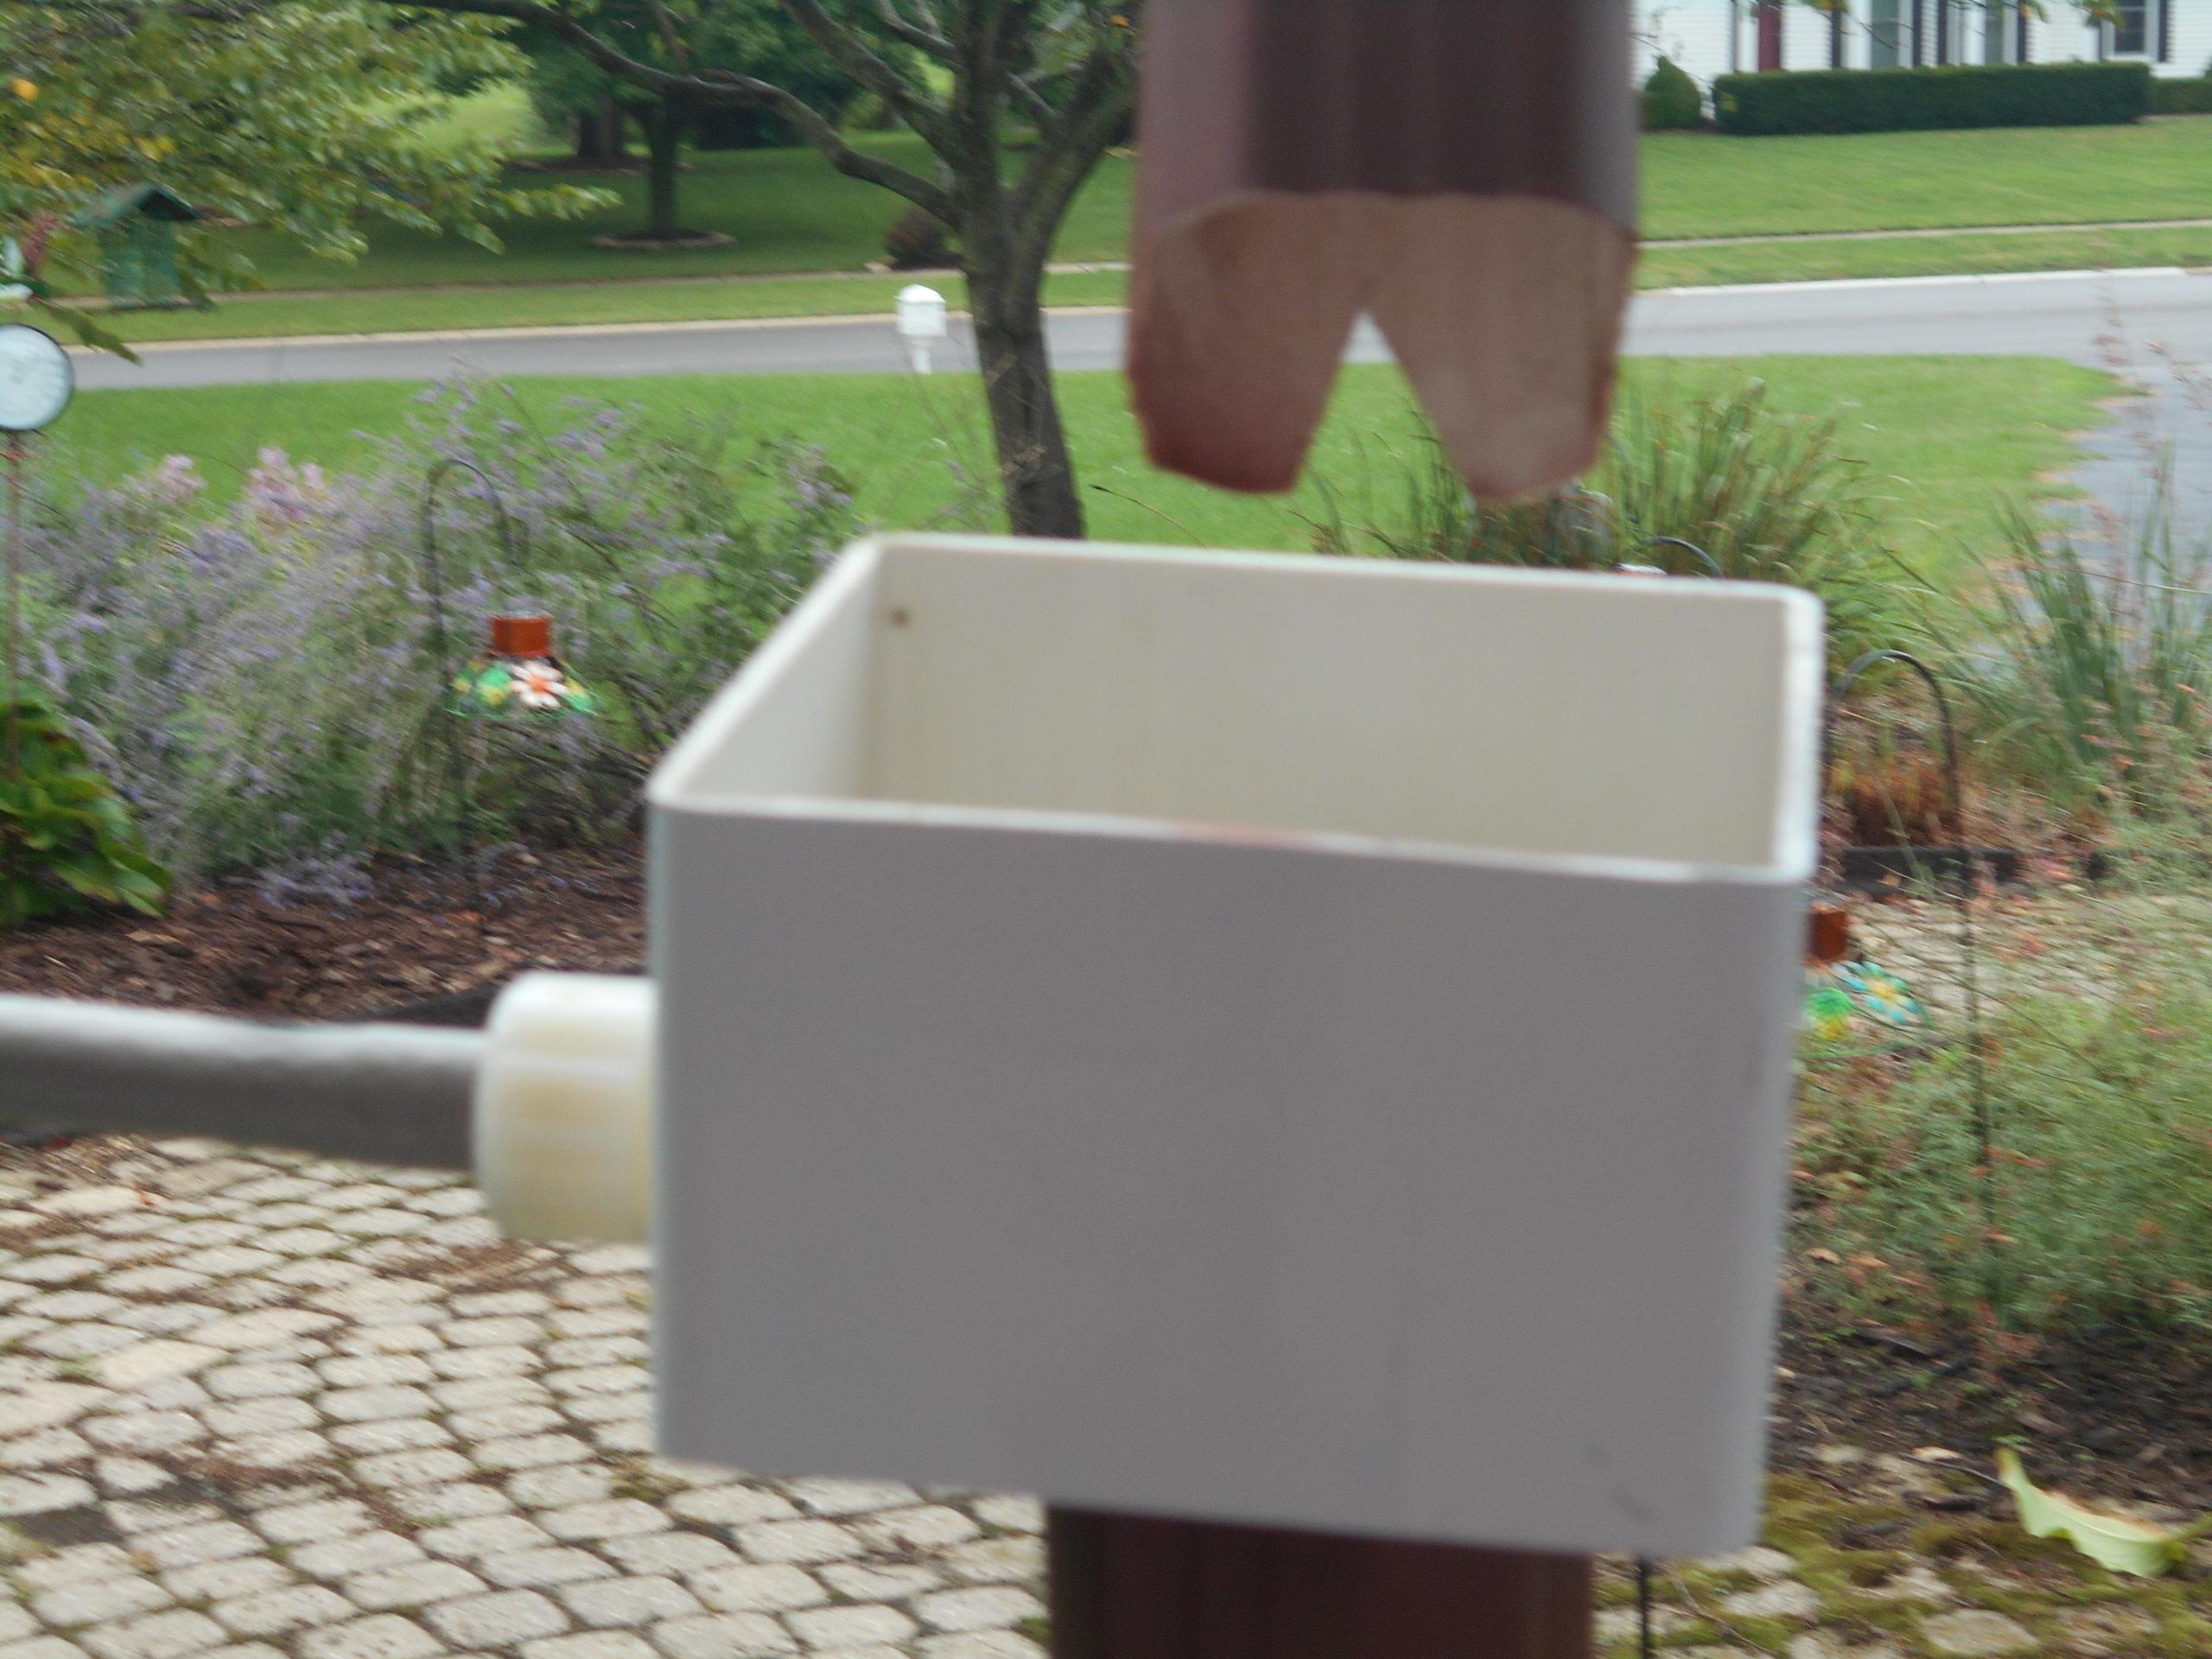 Upcycle Rain Water Diverter